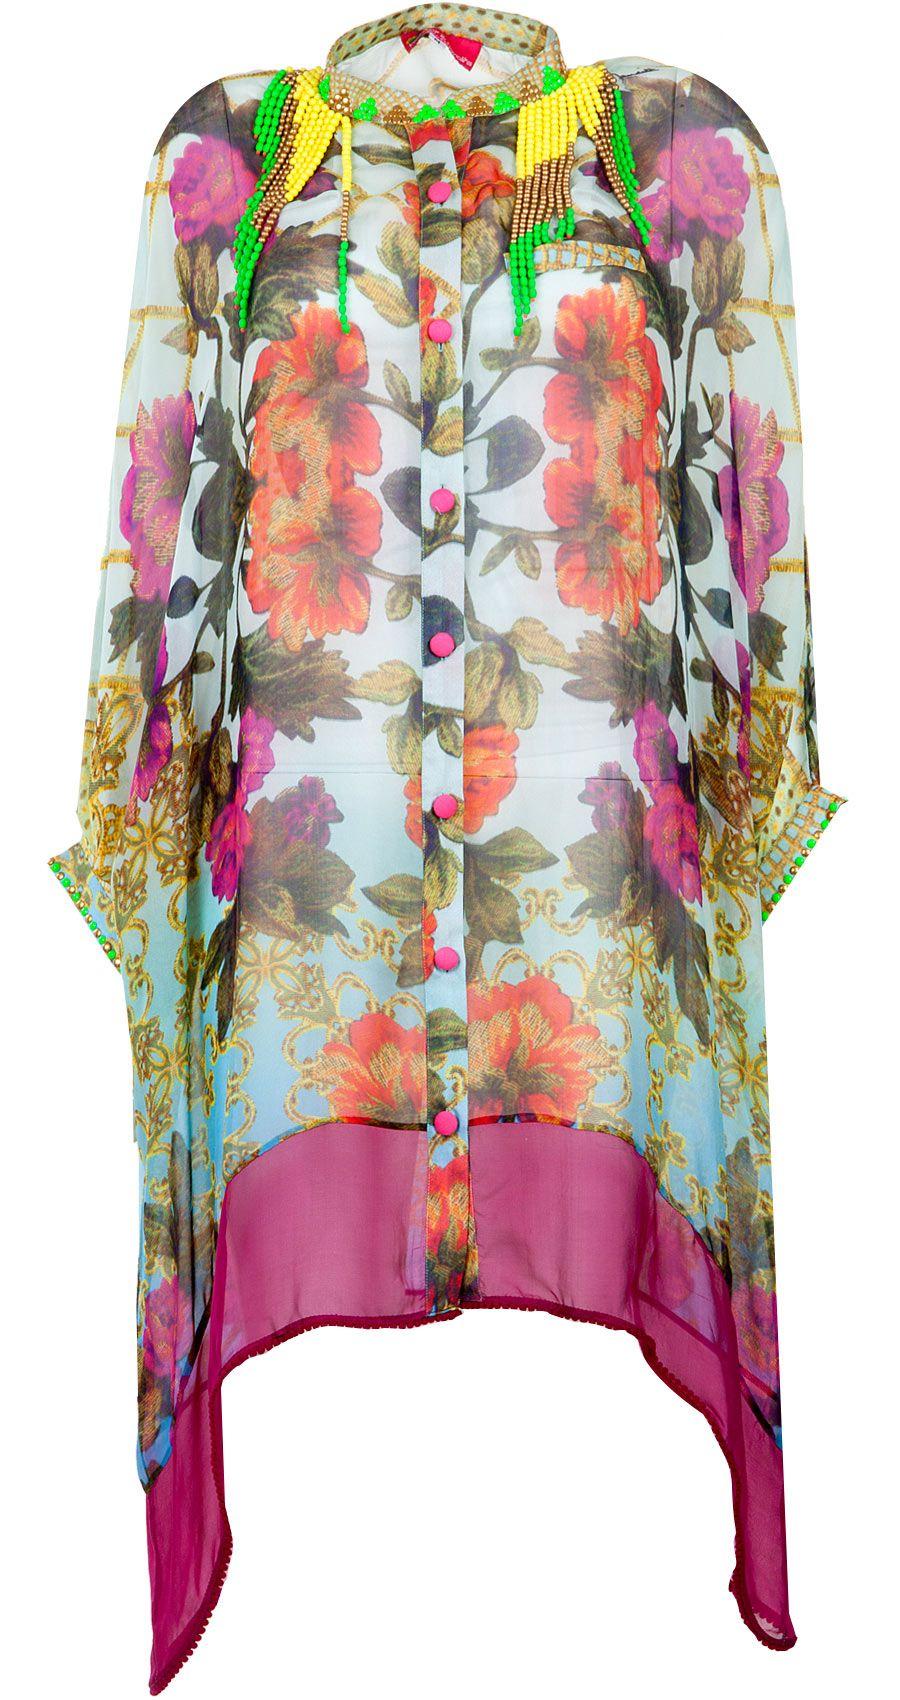 Blue Mat Print Kaftaan Shirt Available Only At Pernia S